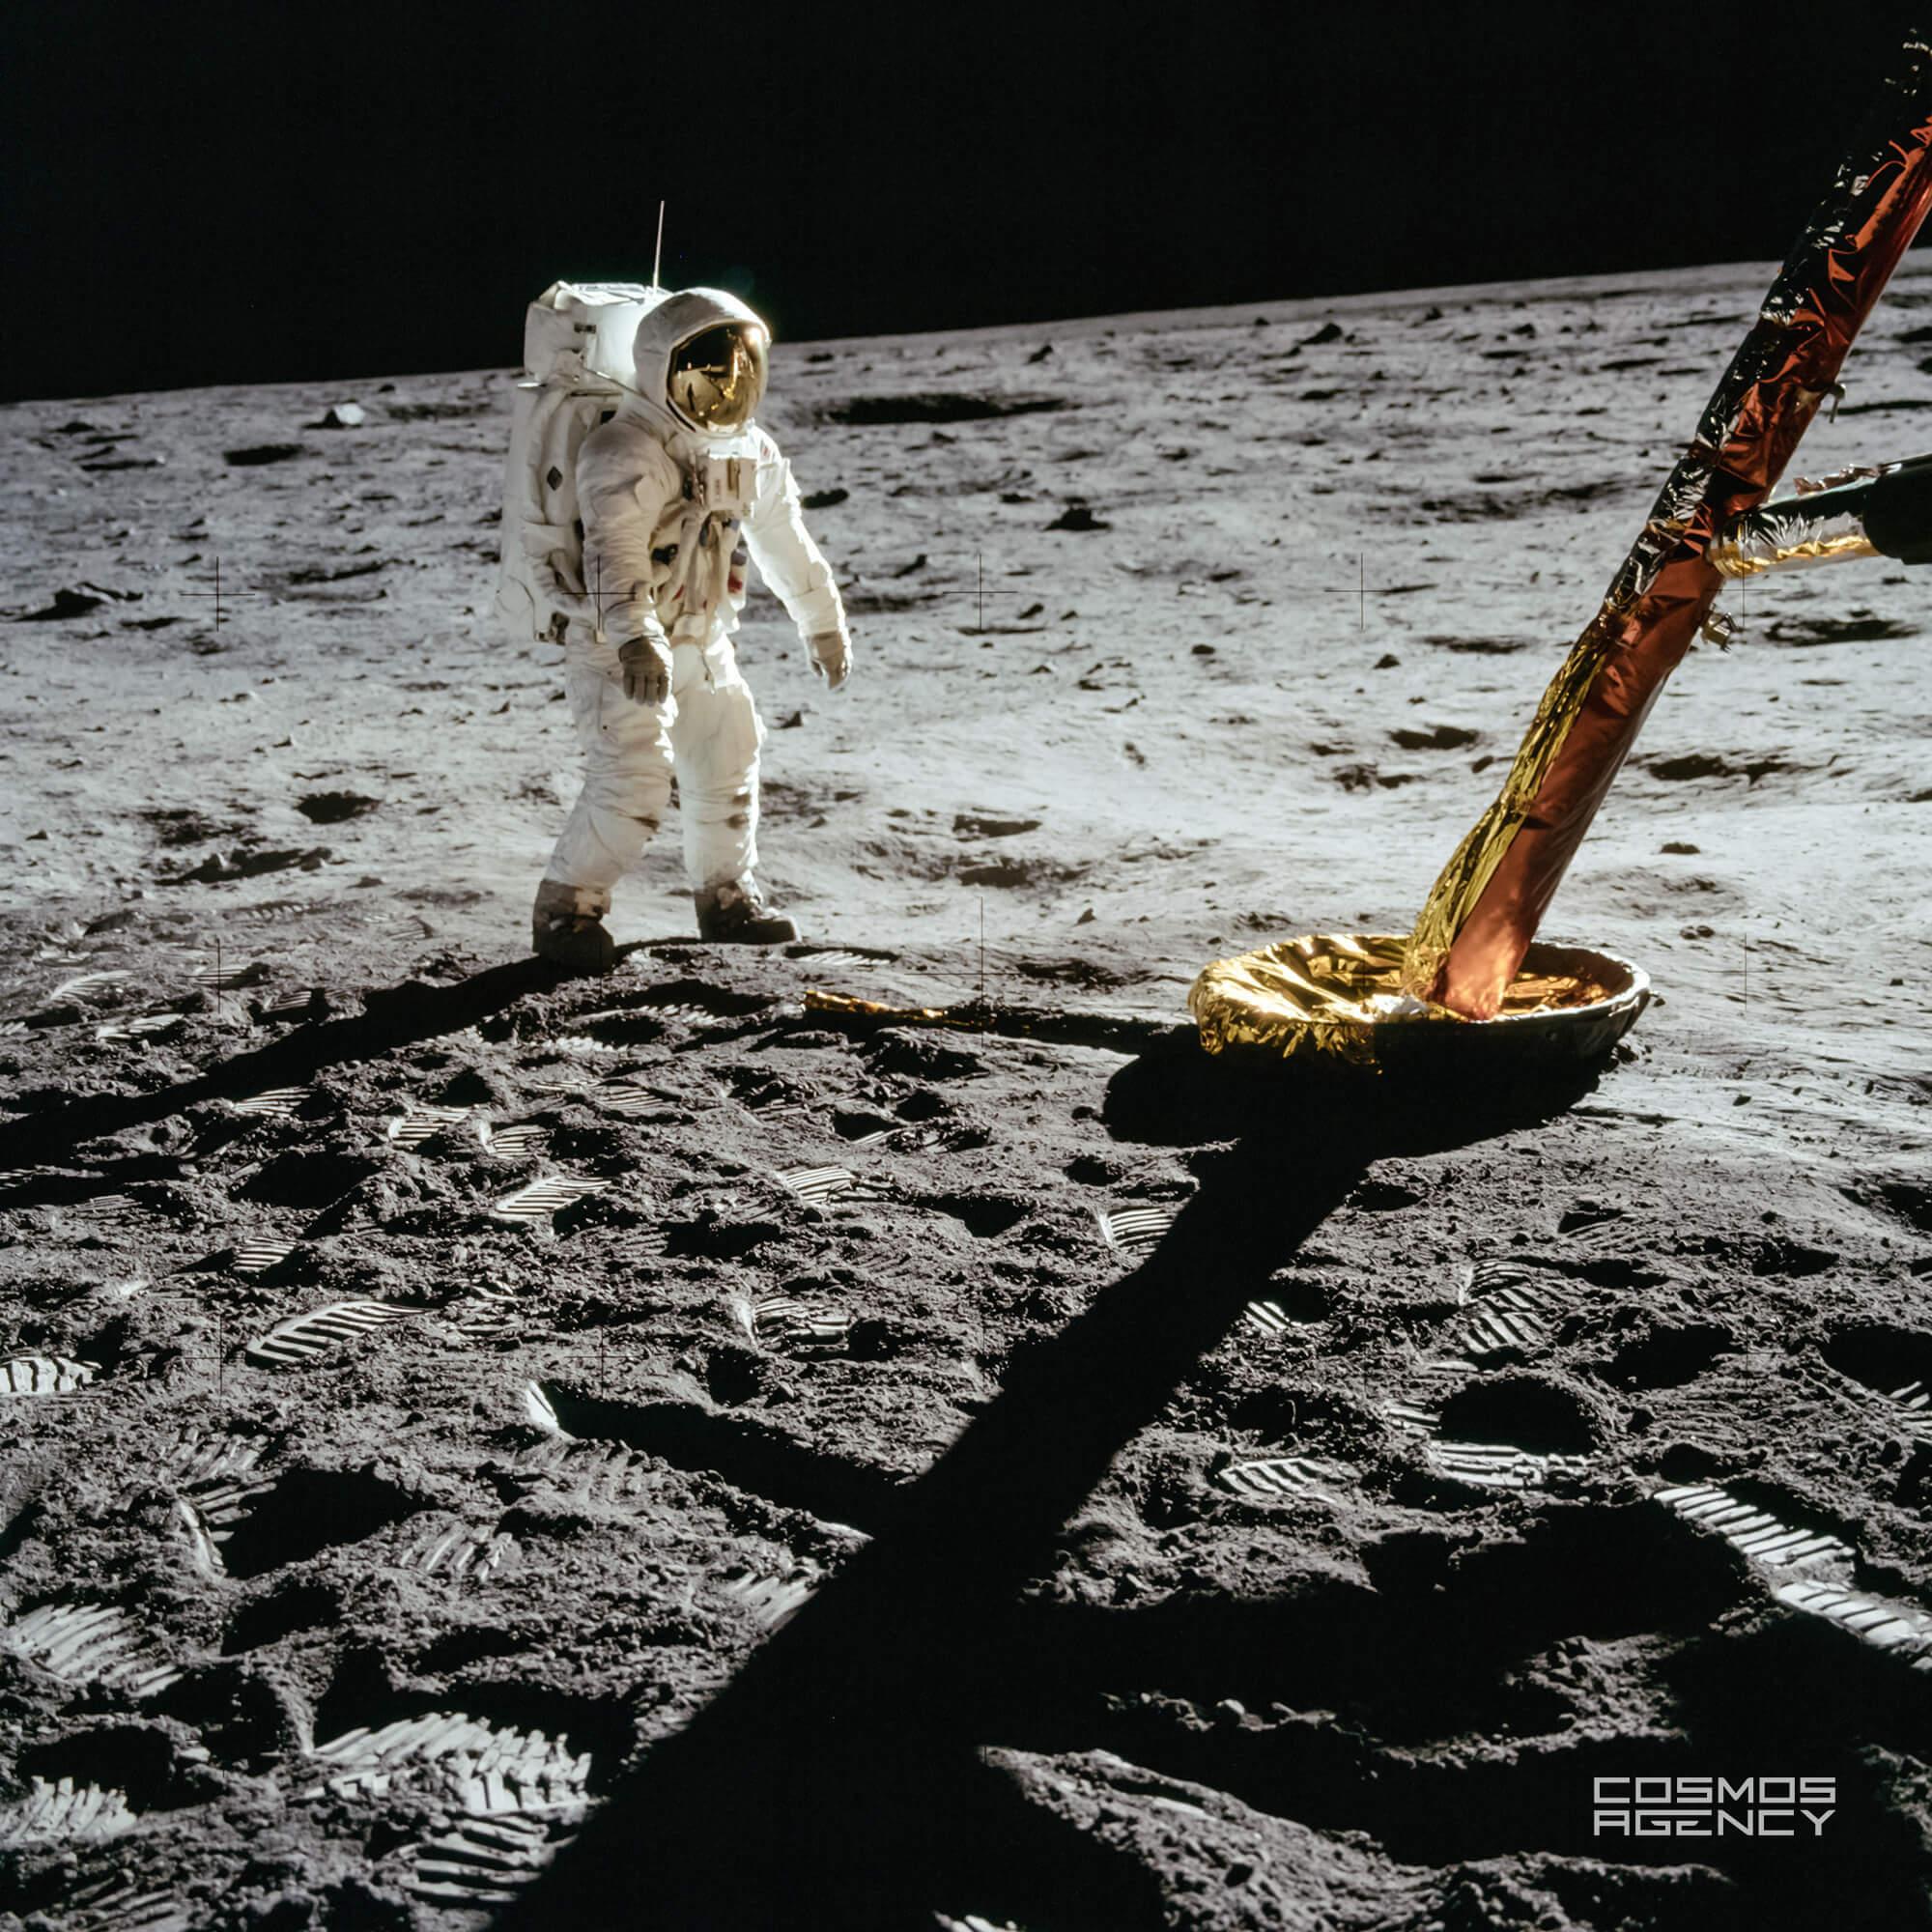 Астронавт NASA Базз Олдрин стоит около стойки и зонда Лунного модуля, Аполлон 11, 1969